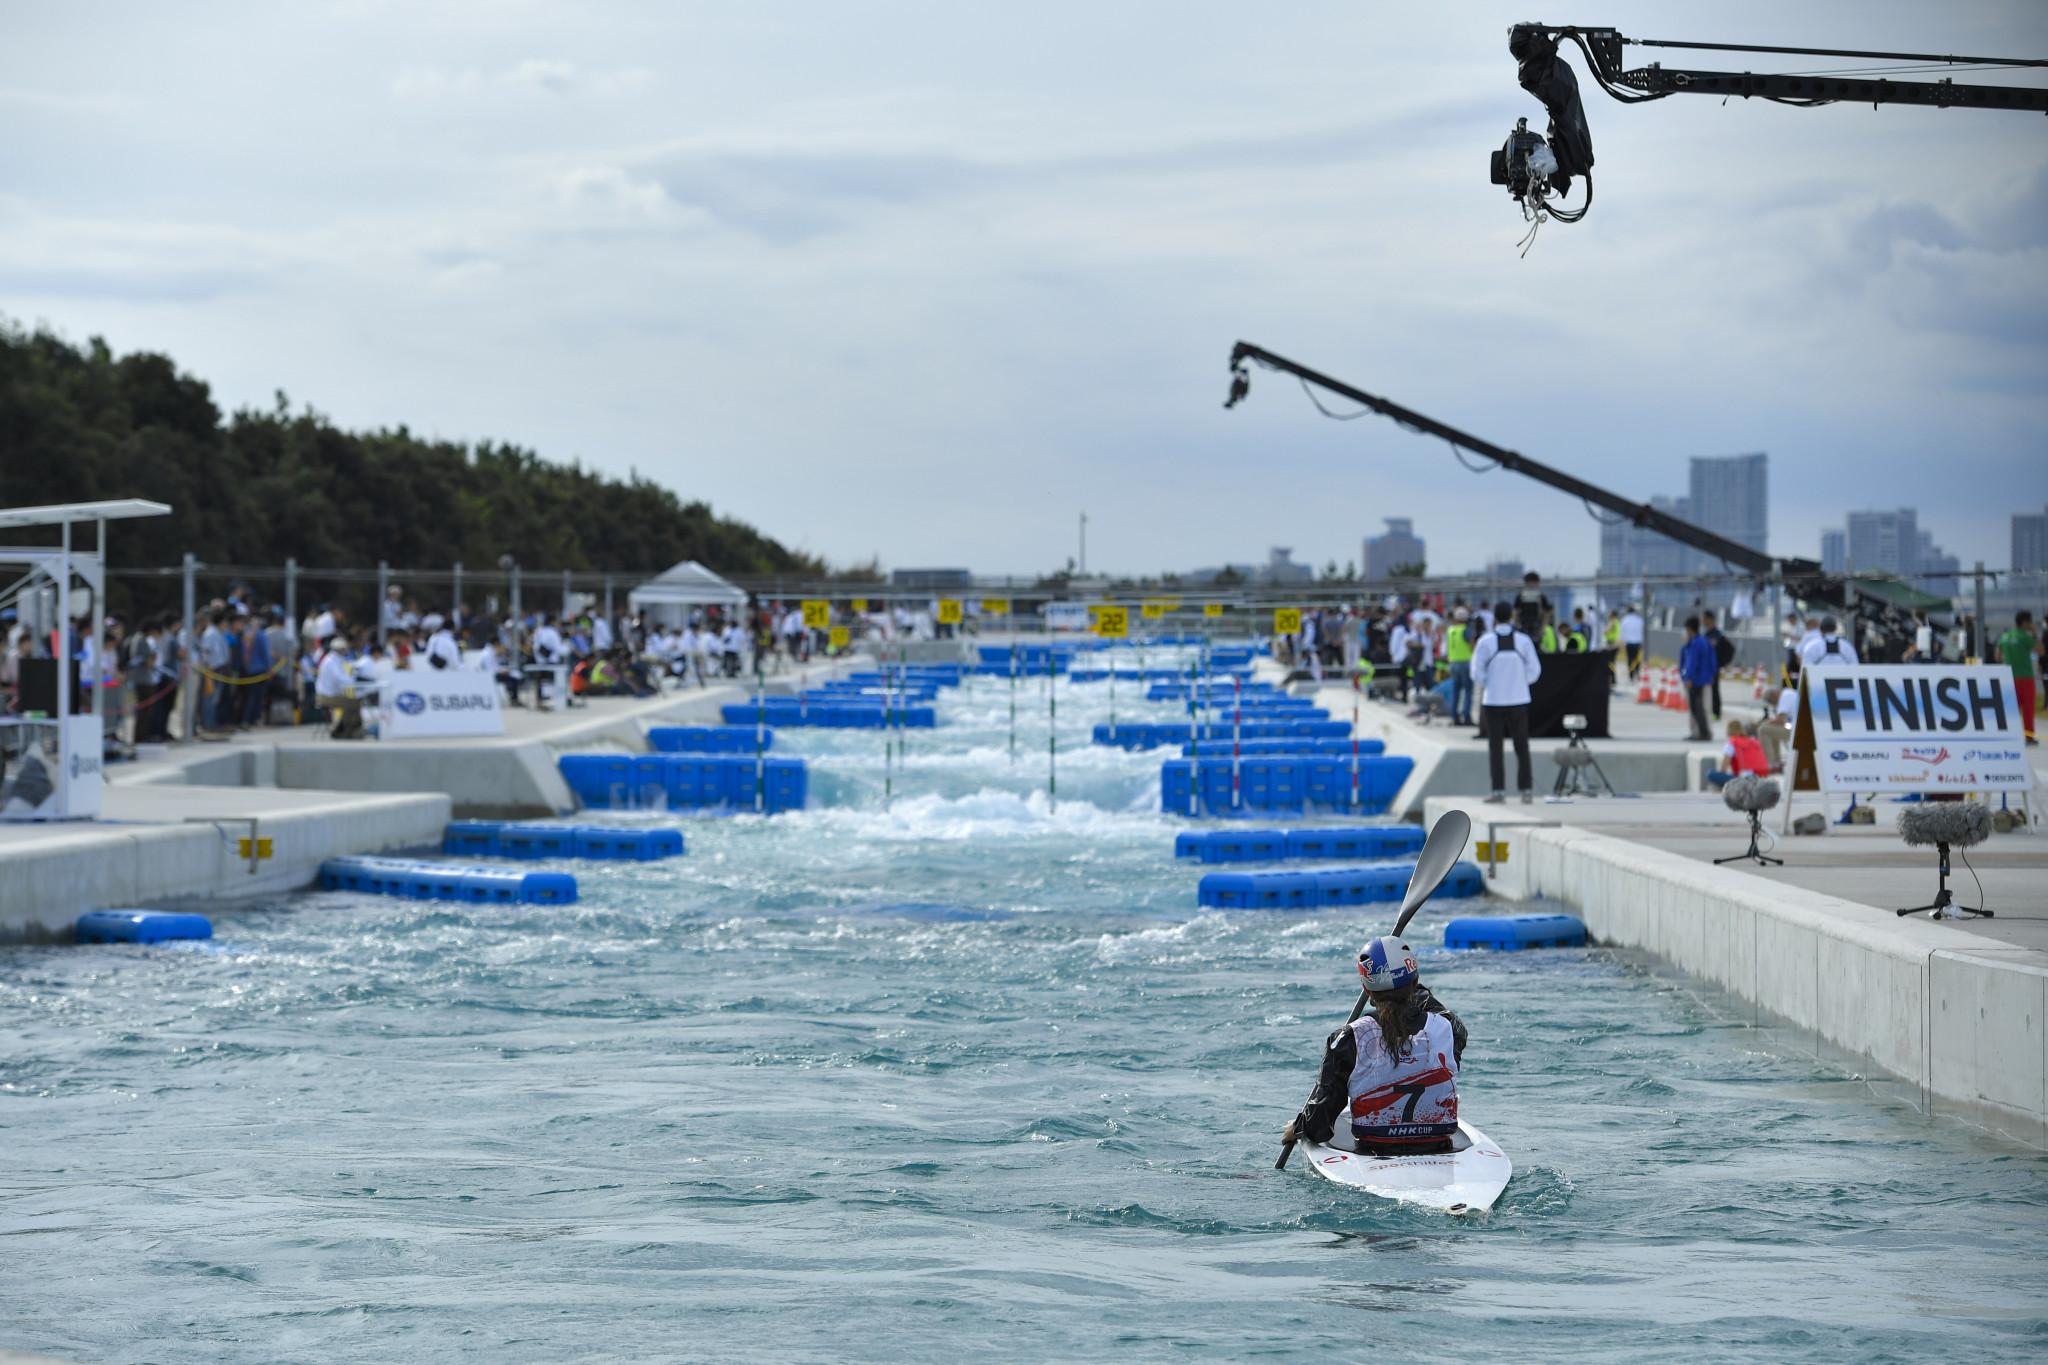 Tokyo 2020 canoe slalom venue opens for athlete practice